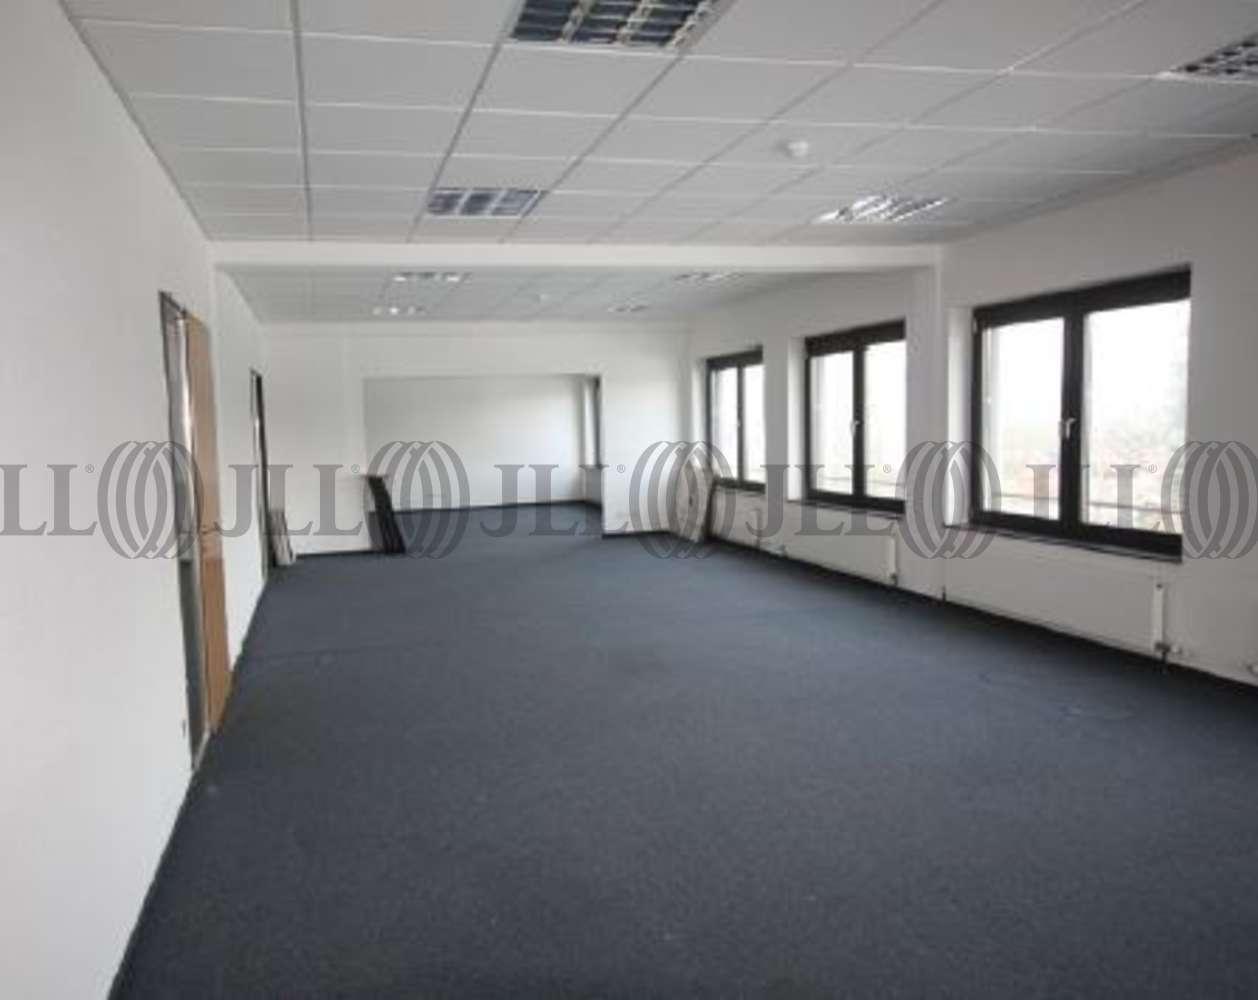 Büros Bielefeld, 33604 - Büro - Bielefeld, Sieker - H1083 - 9410138